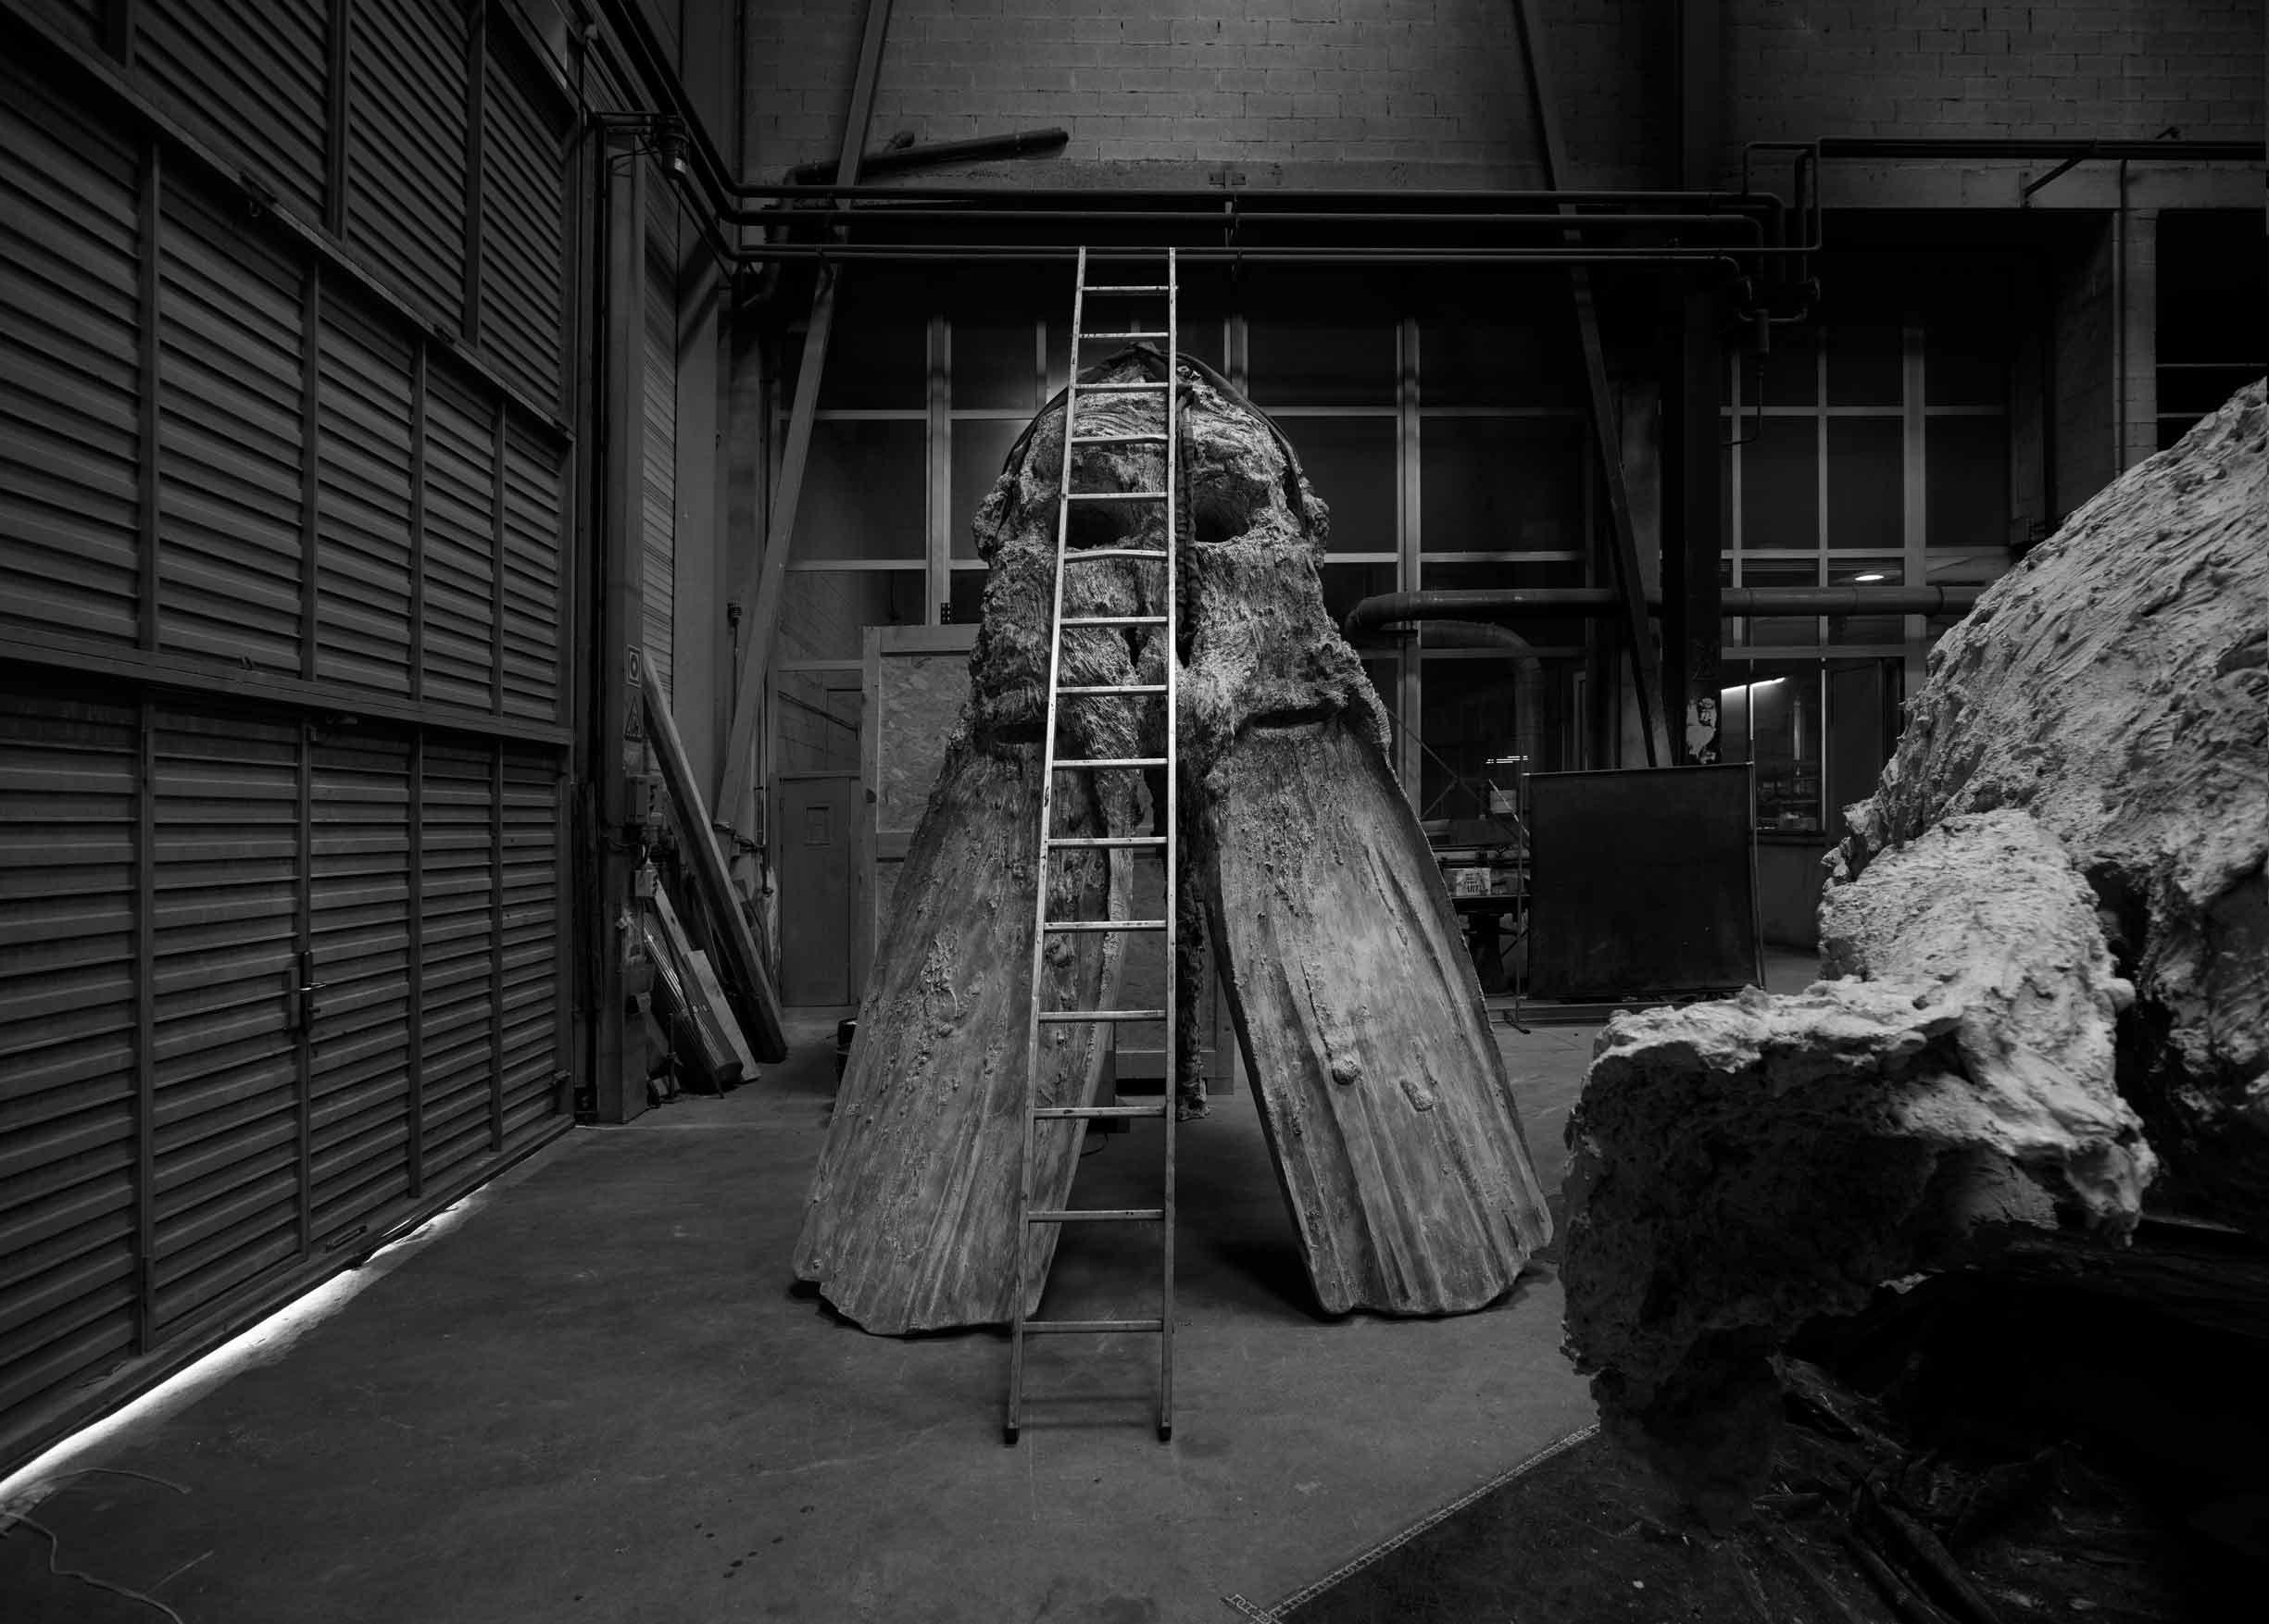 Bronze sculpture, ALYCASTRE, by Miquel Barceló, manufacturing process in Alfa Arte - Courtesy Collection Carmignac